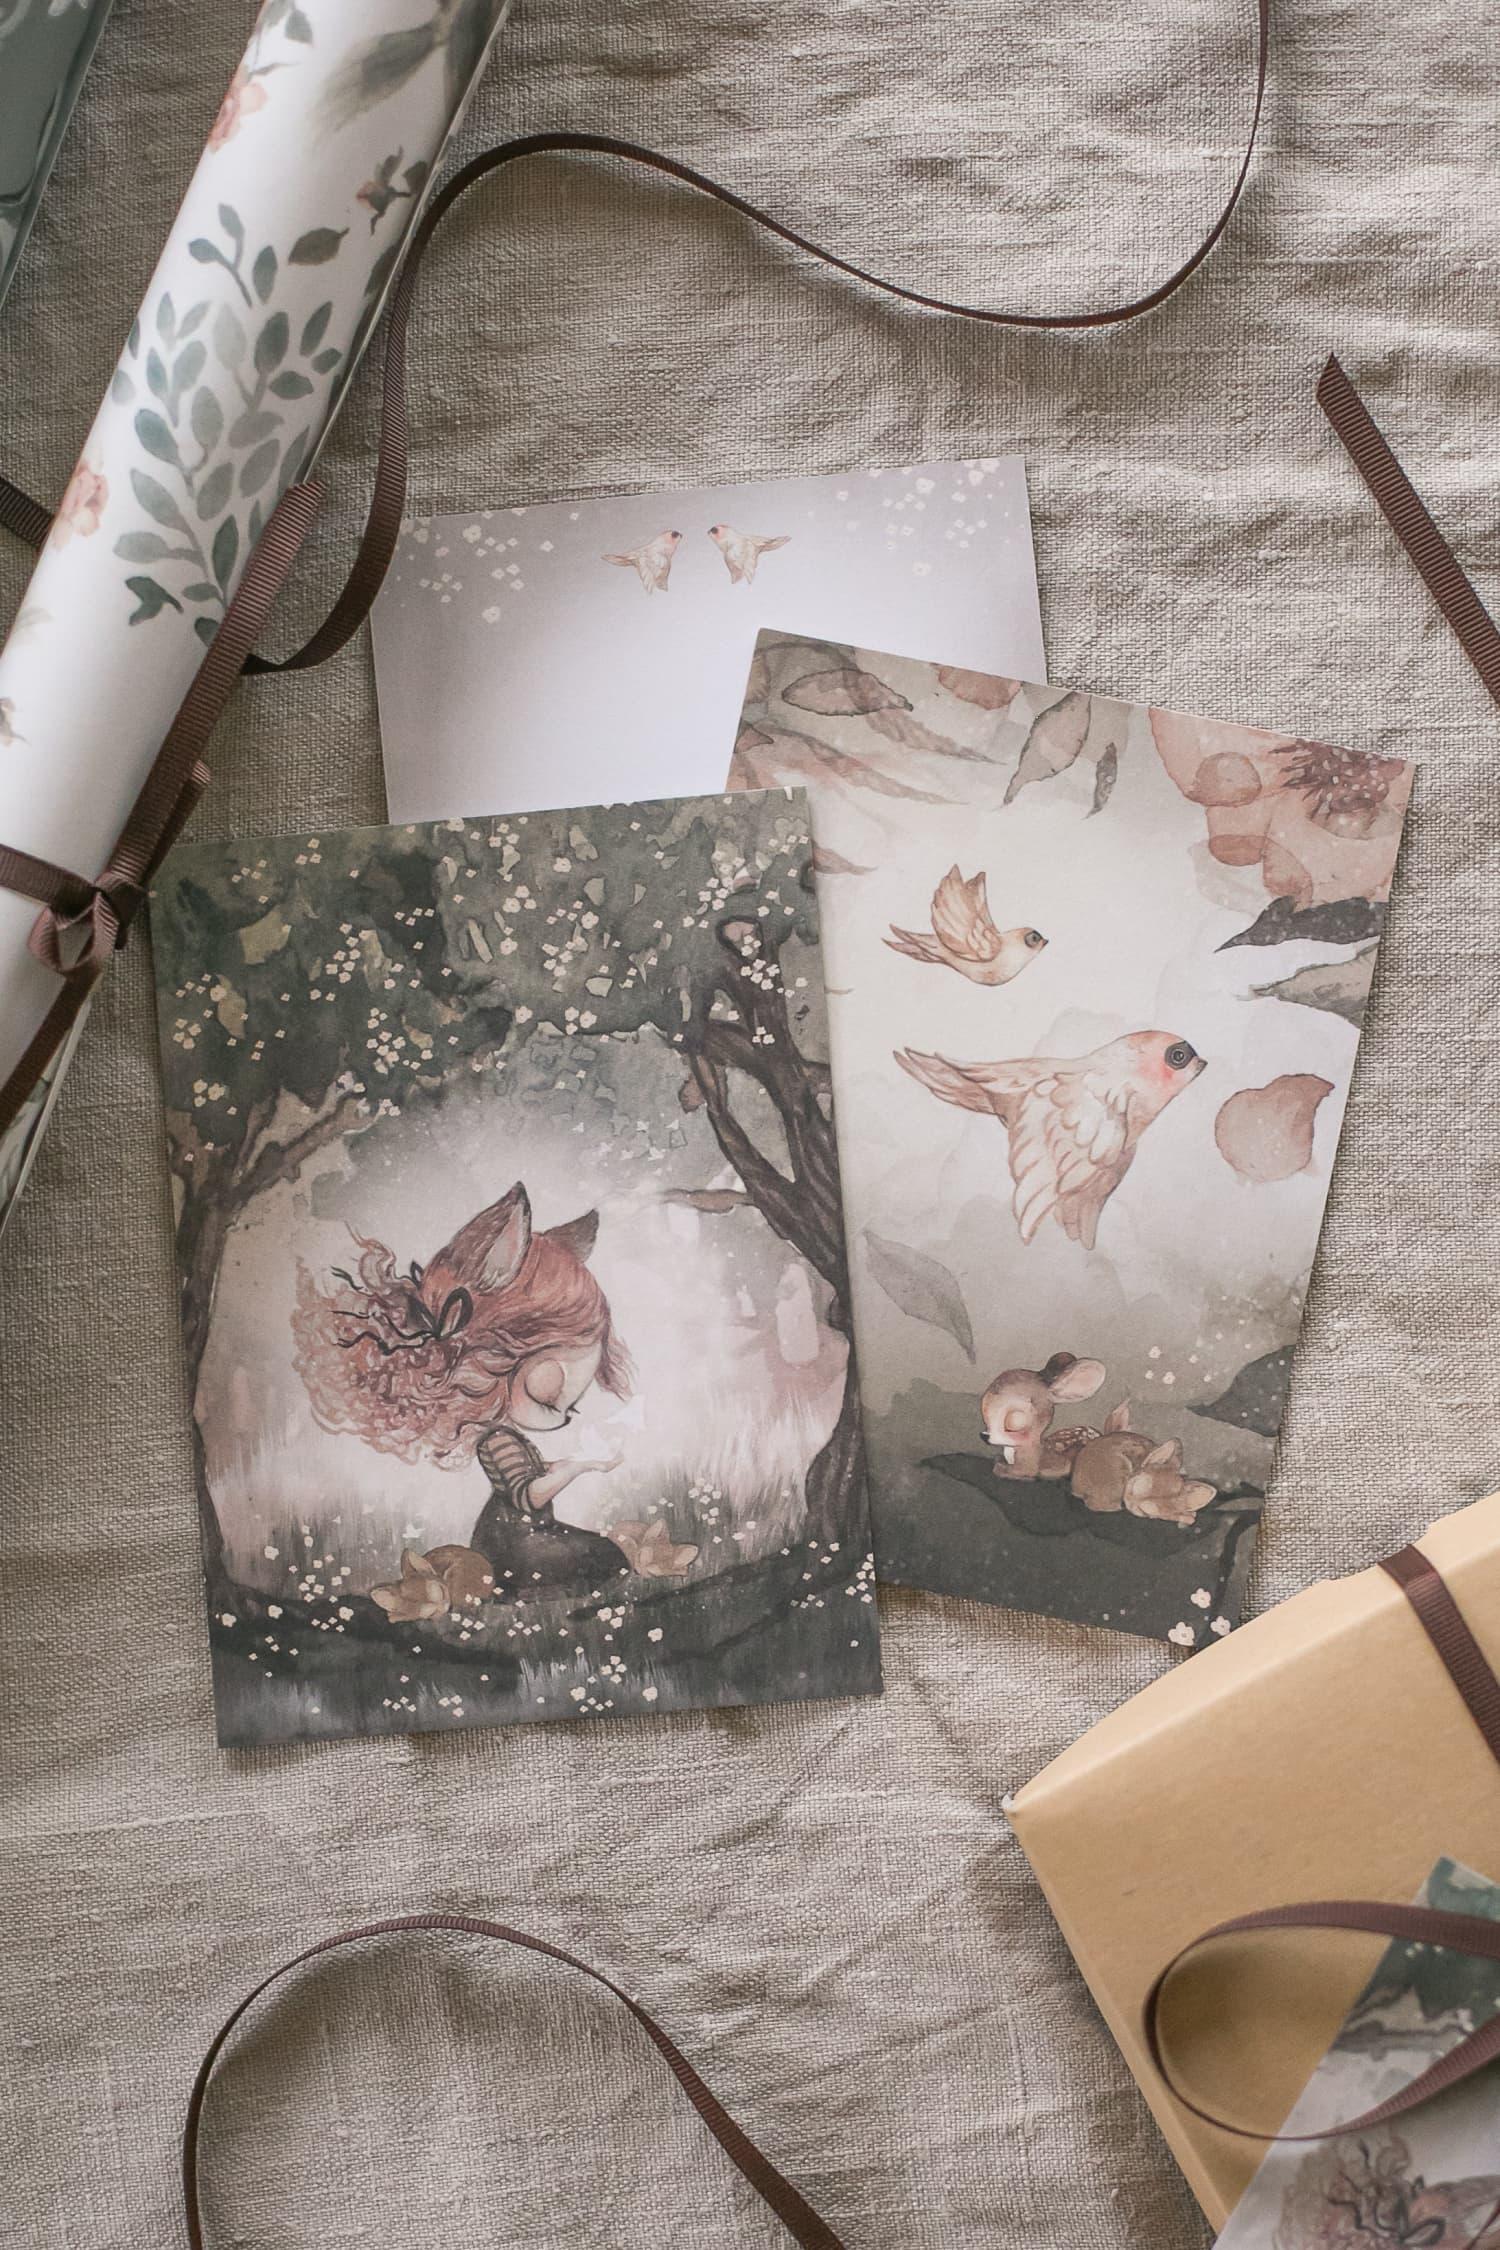 mrs_Mighetto_Cards_Woods_Birds_dadaboom_sk